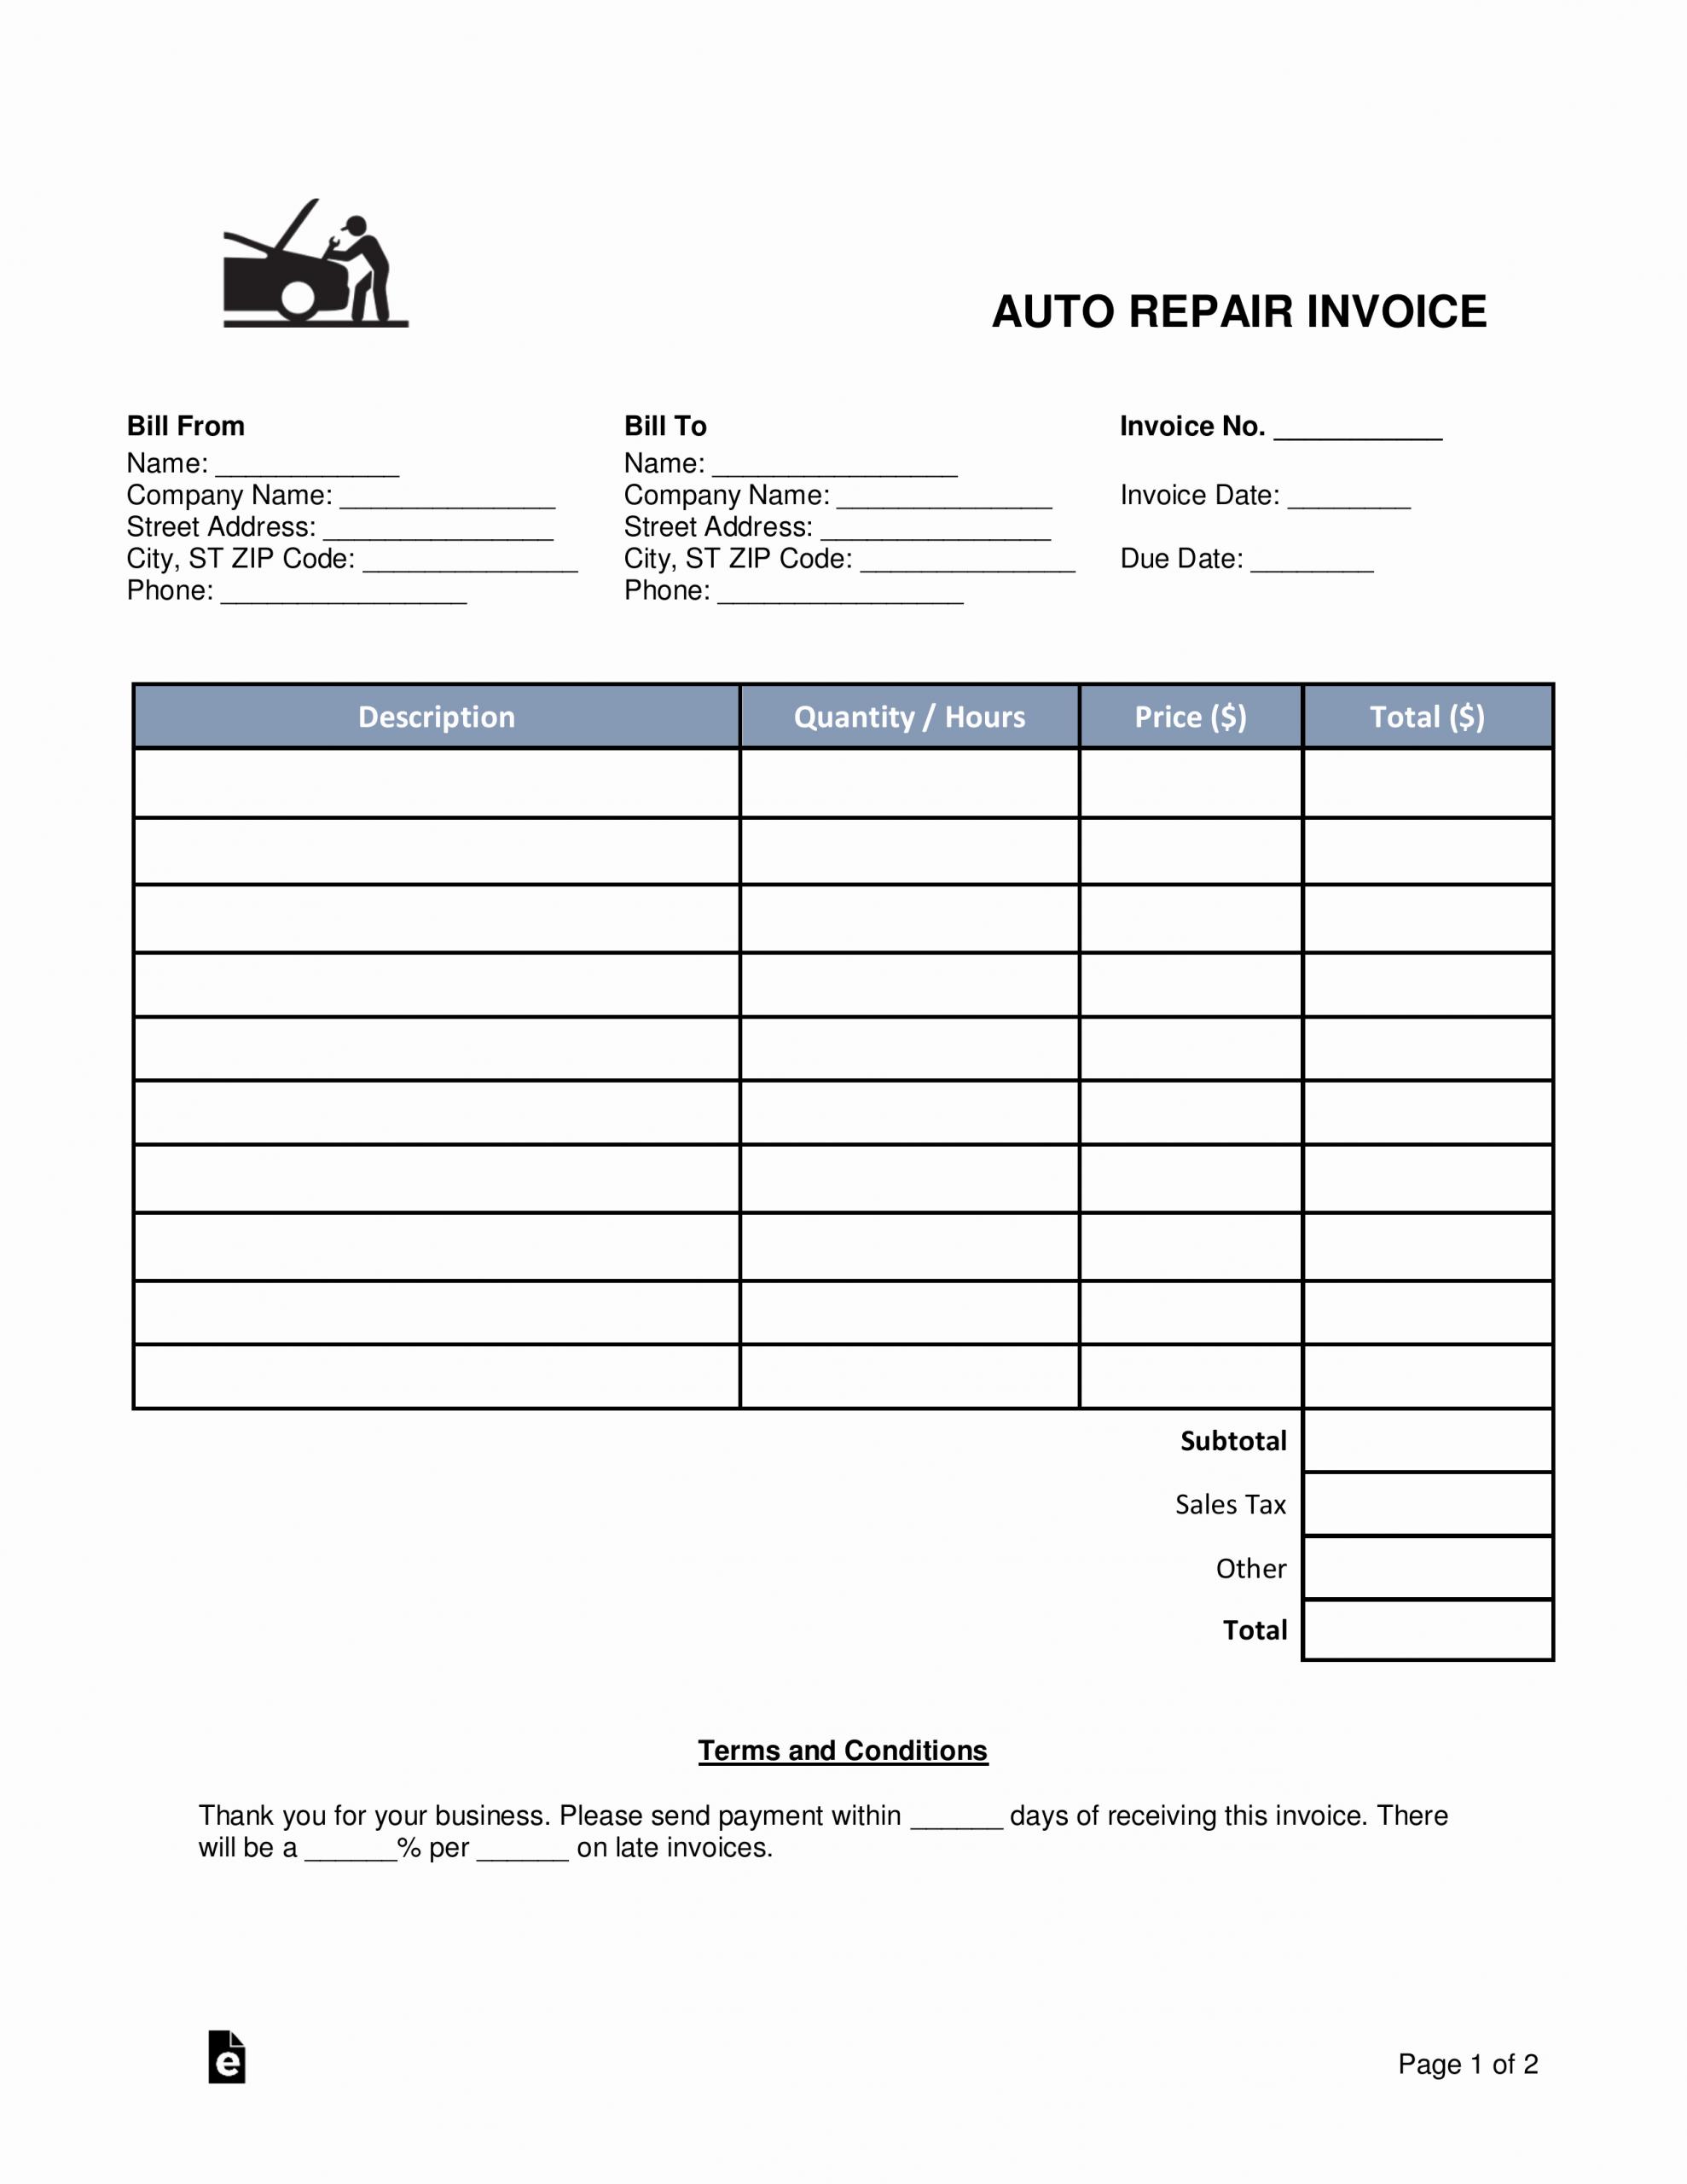 Truck Repair Invoice Template Unique Free Auto Body Mechanic Invoice Template Word